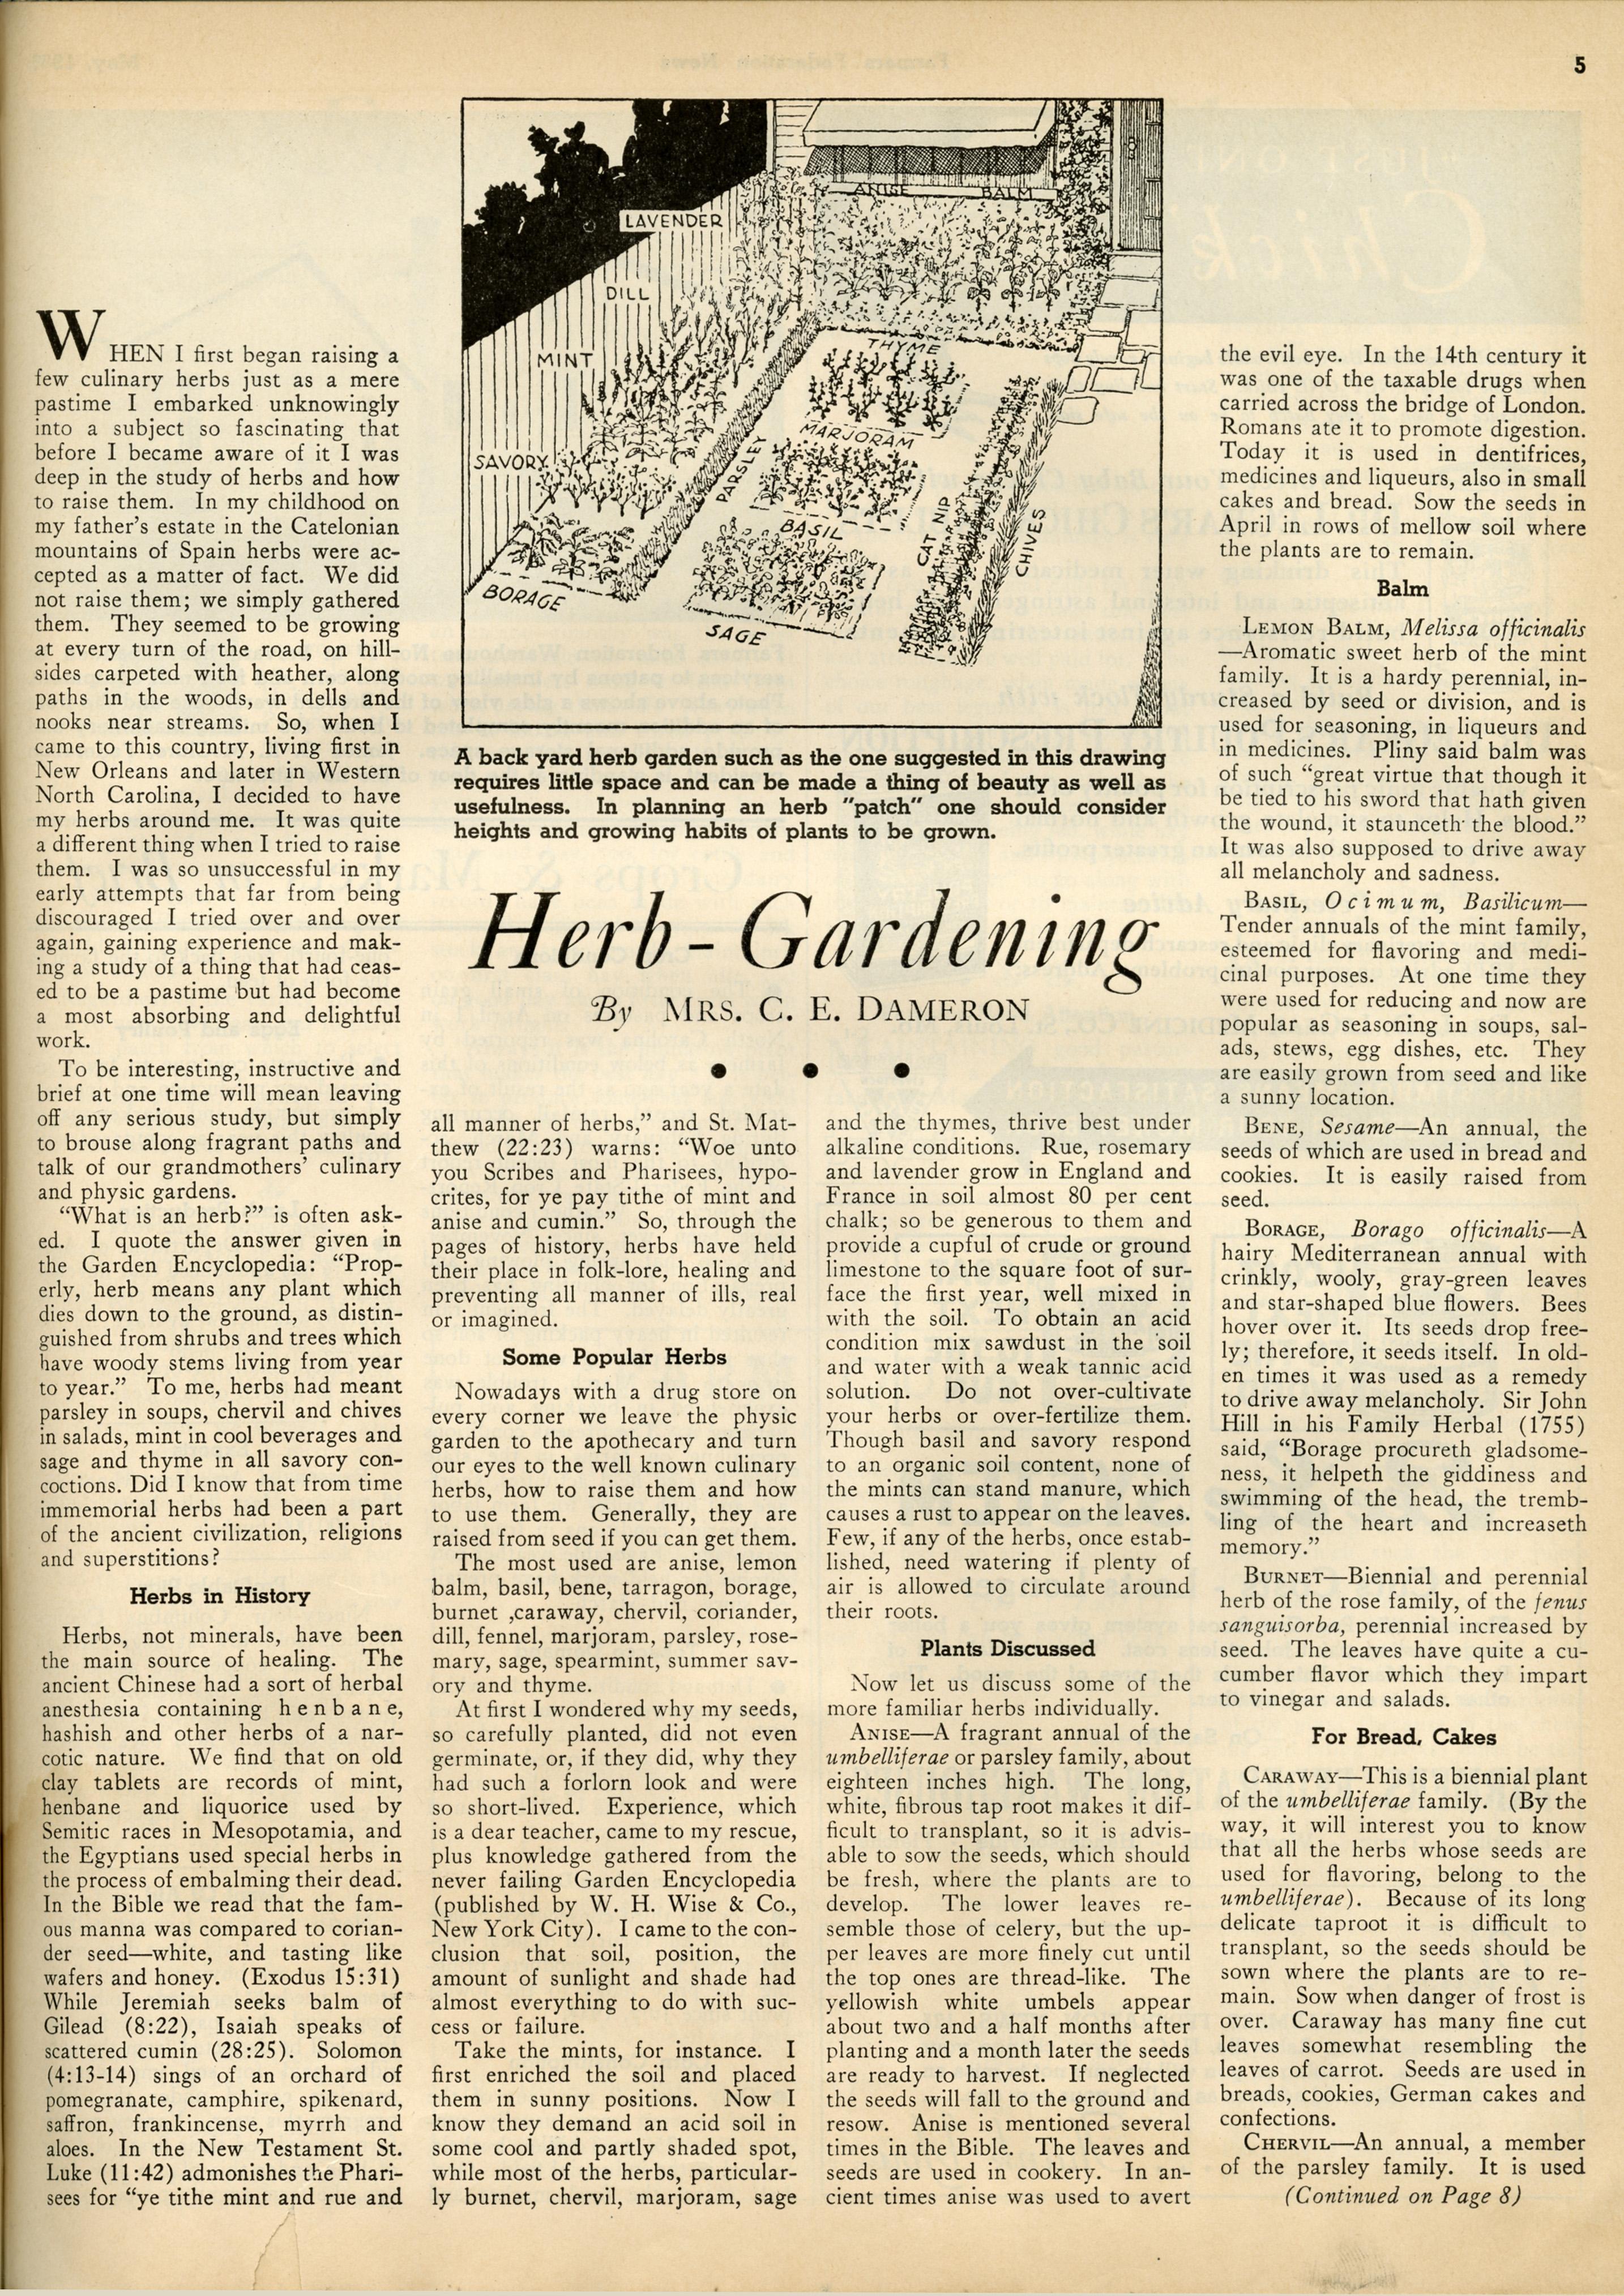 Herb-Gardening_1939_05_05.jpg